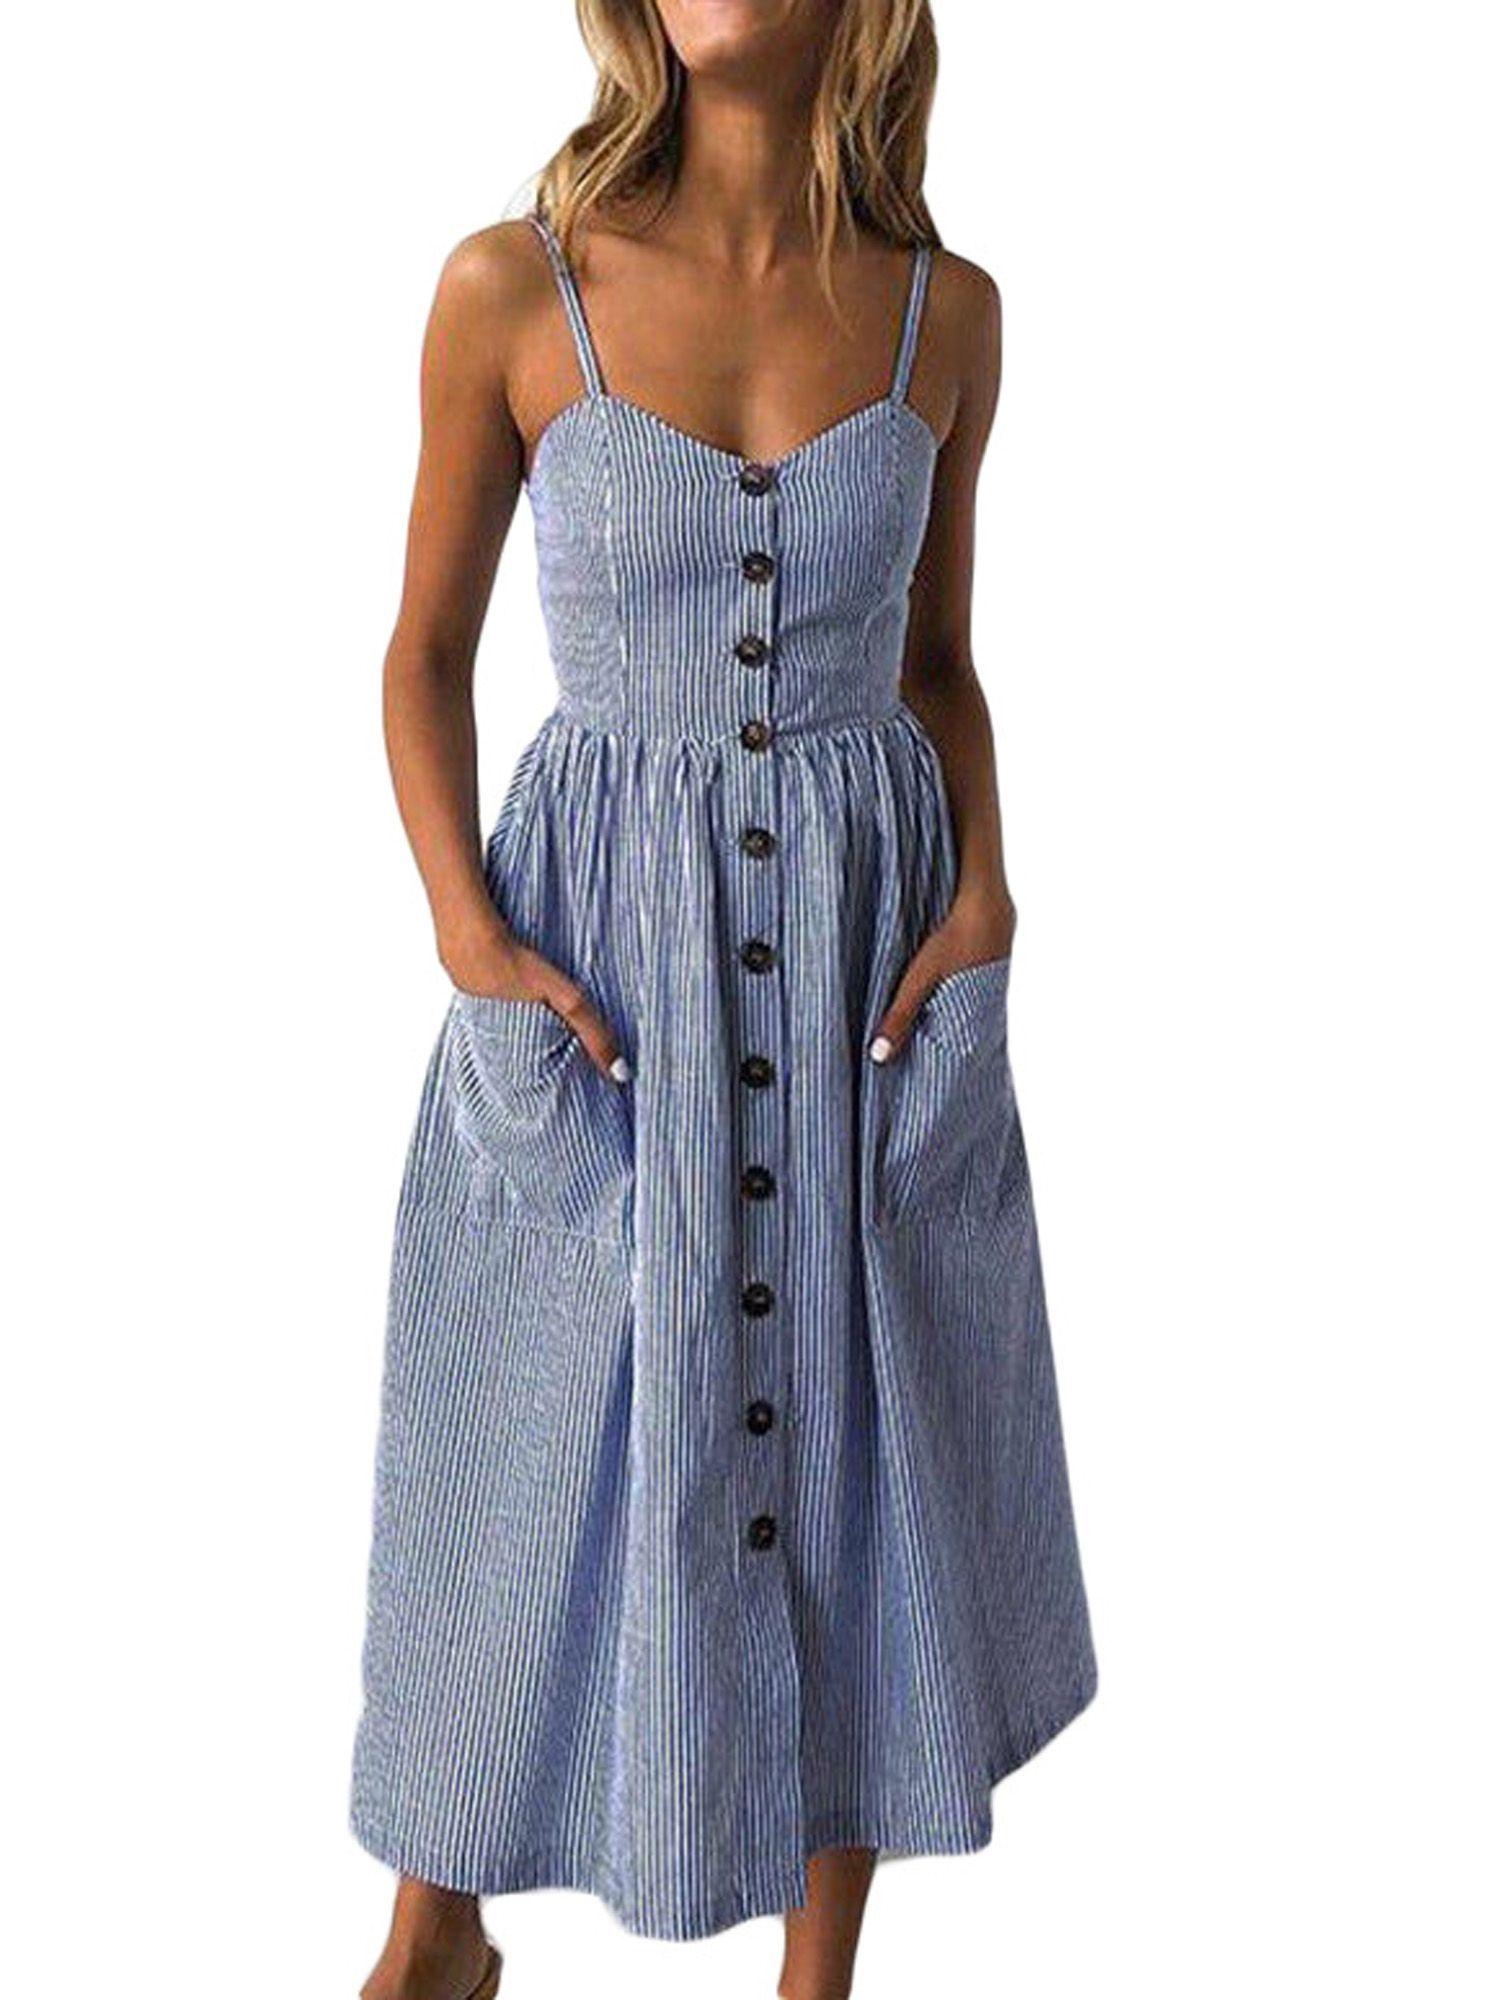 Wodstyle Women S Strappy Floral Summer Beach Party Midi Swing Dress Walmart Com Midi Swing Dress Summer Dresses For Women Summer Dresses [ 2000 x 1500 Pixel ]